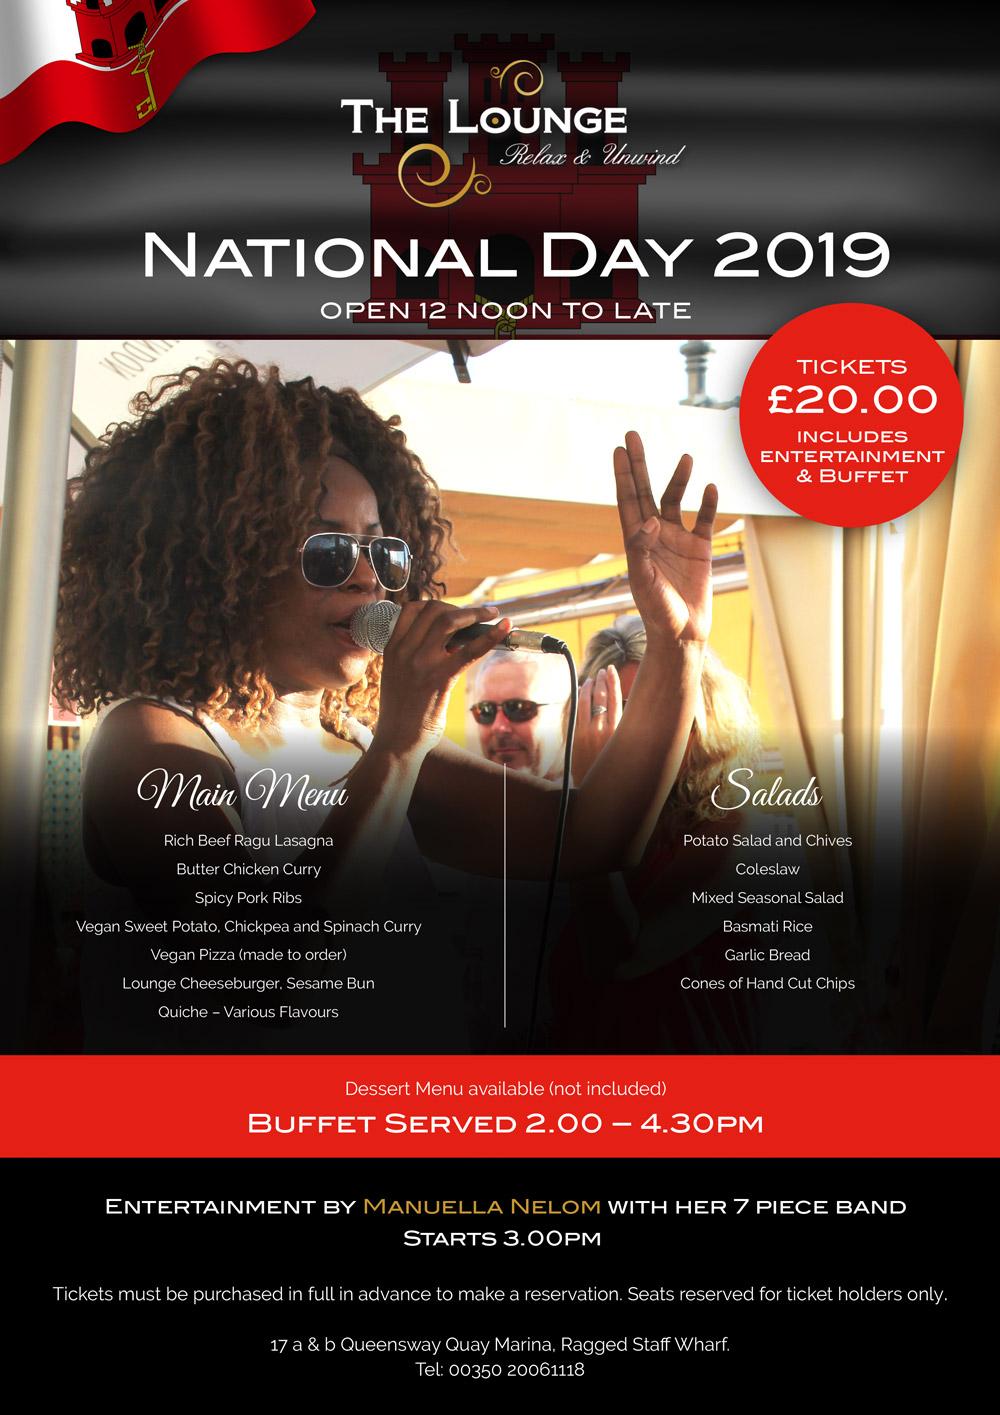 National Day Menu Image